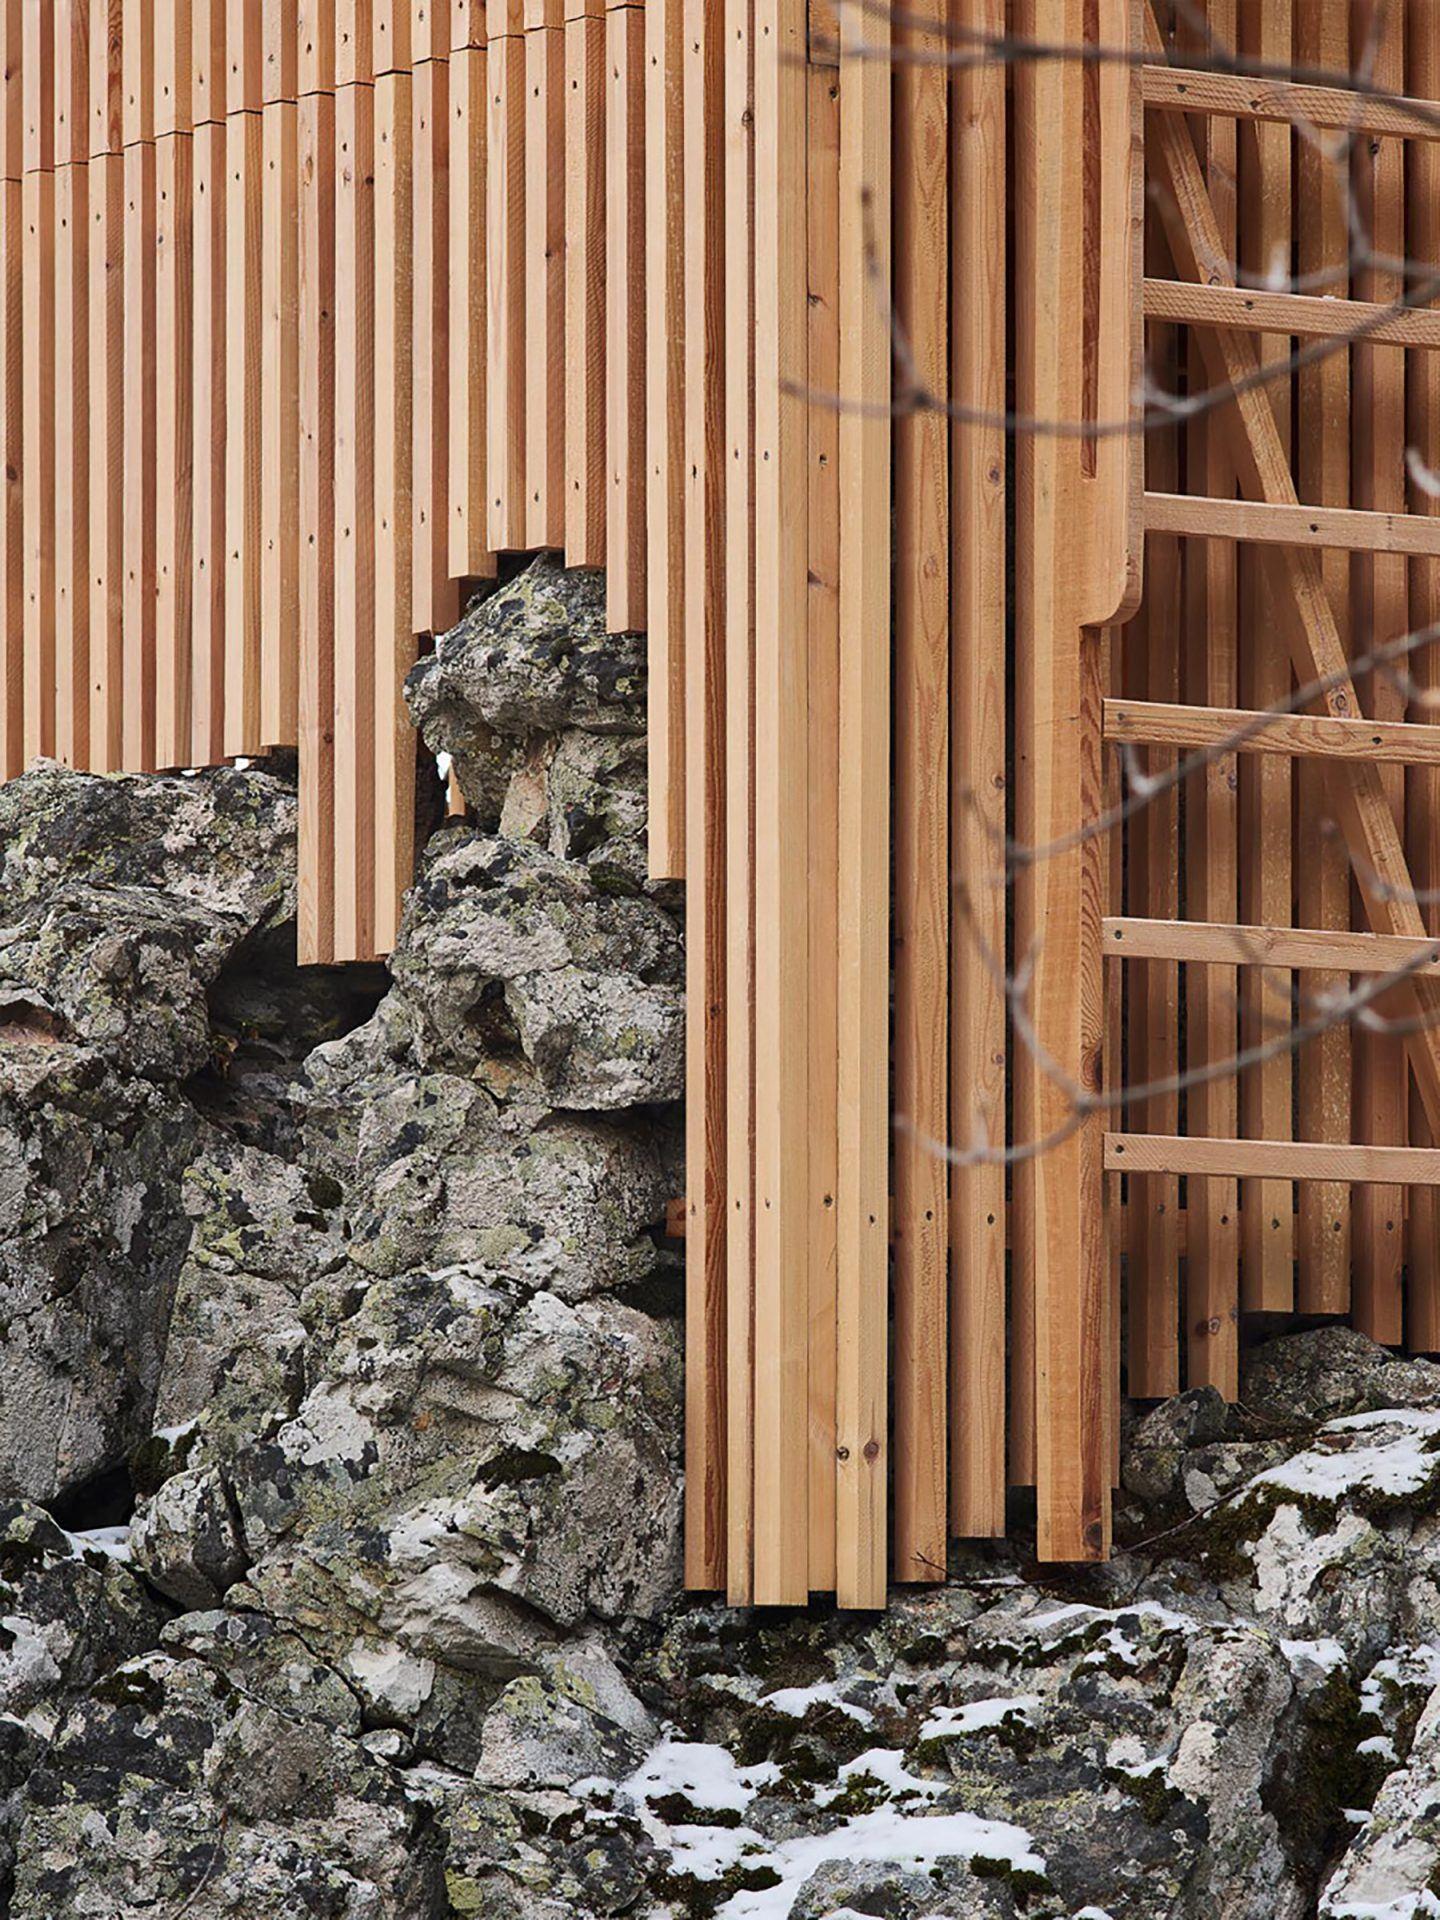 IGNANT-Architecture-Orma-Observatoire-Du-Cerf-Corse-6